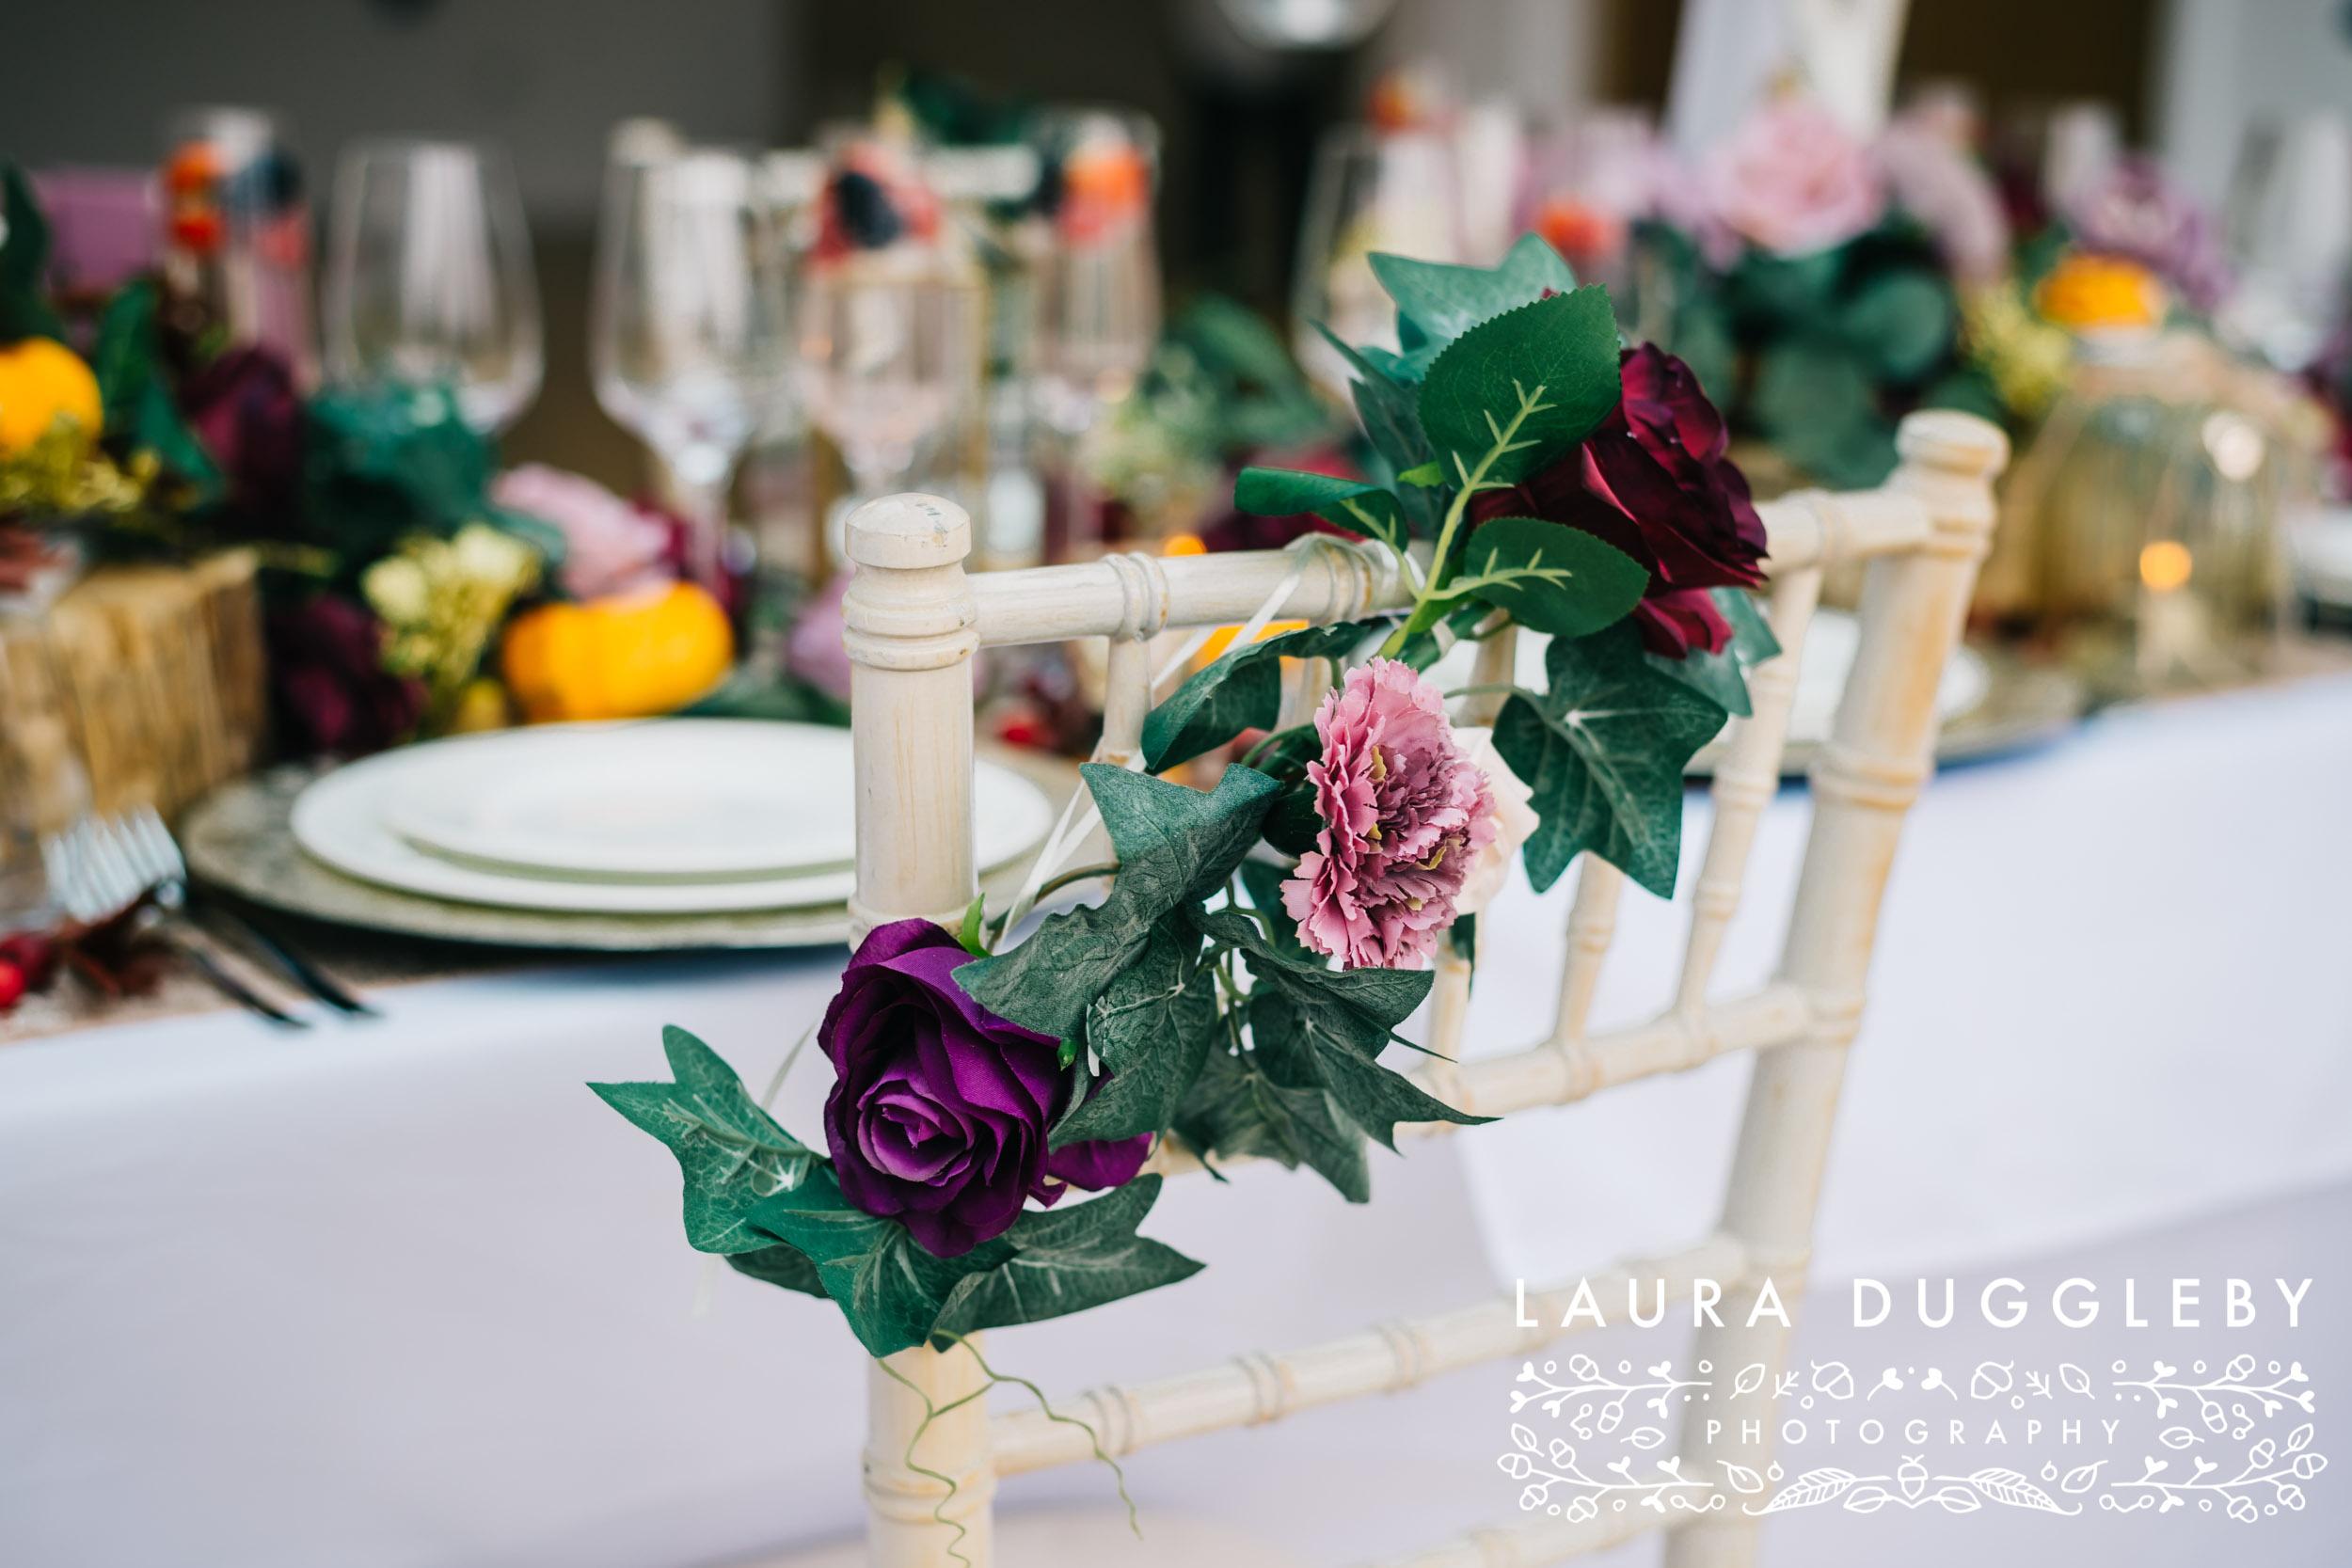 Thornton Hall Country Park - Wedding Photographer7